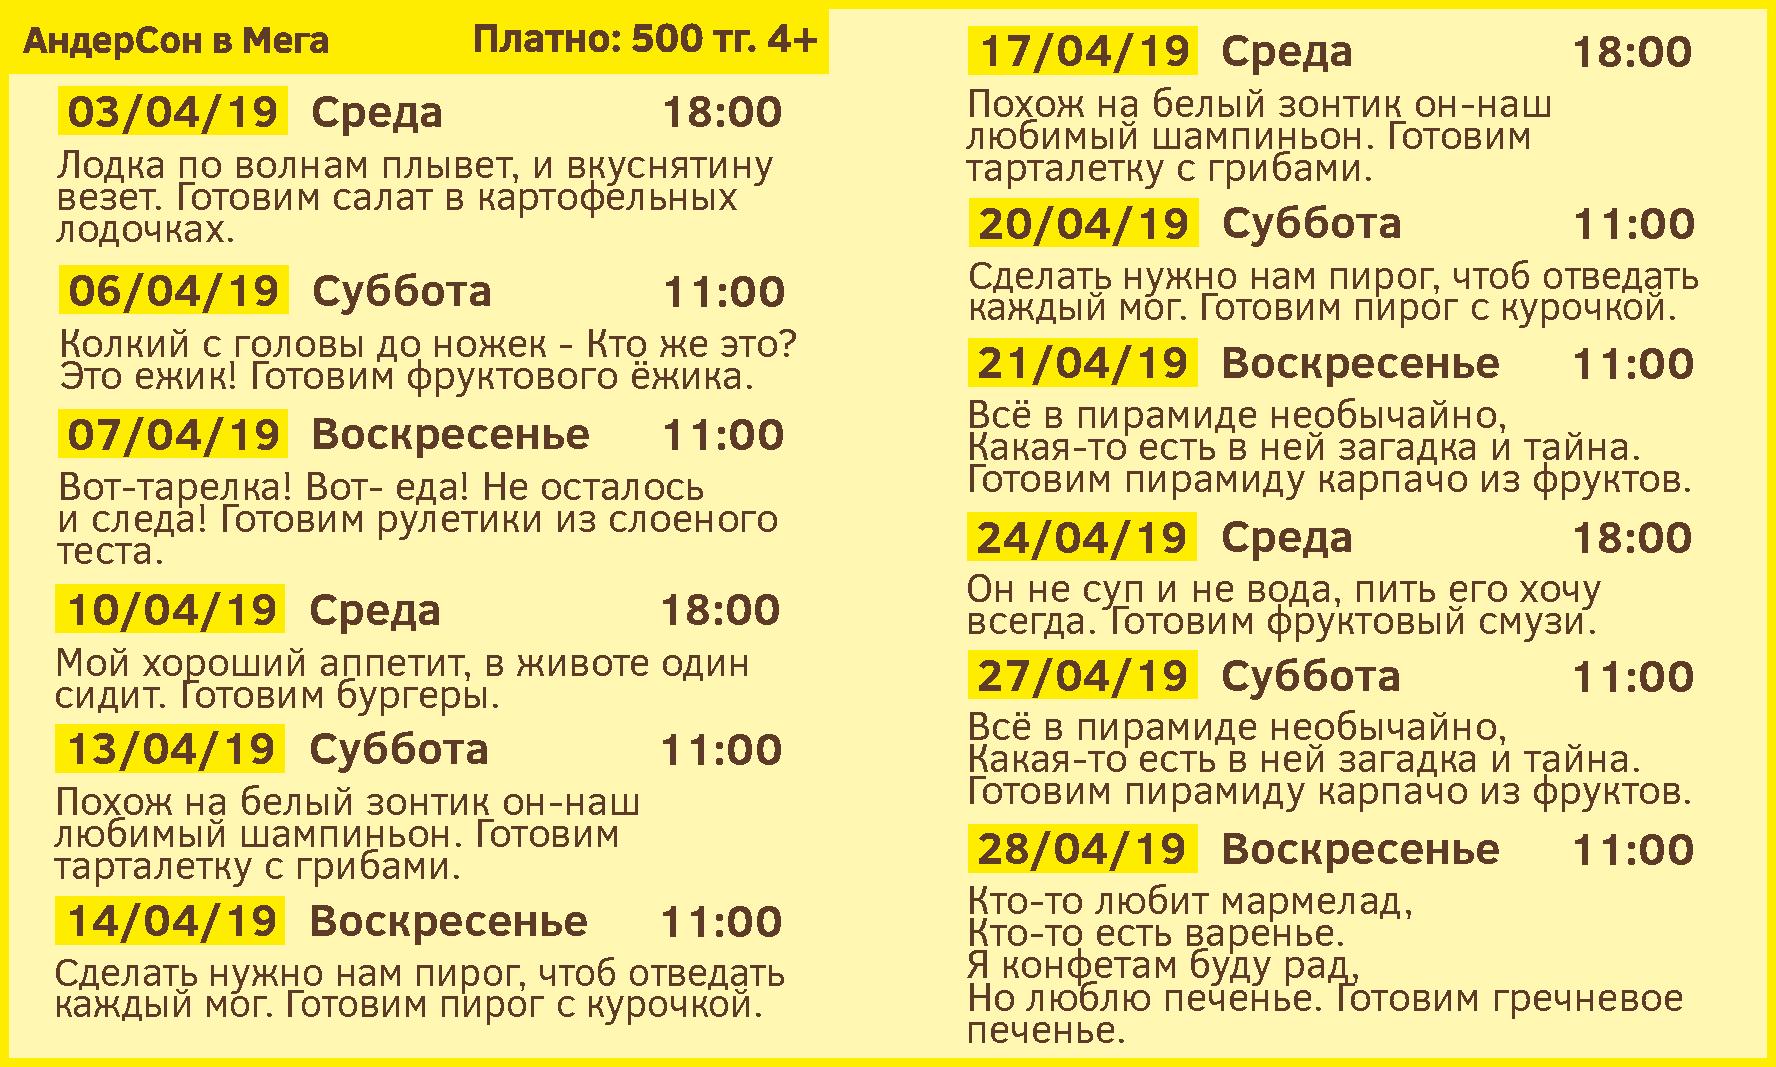 АндерСон на Розыбакиева